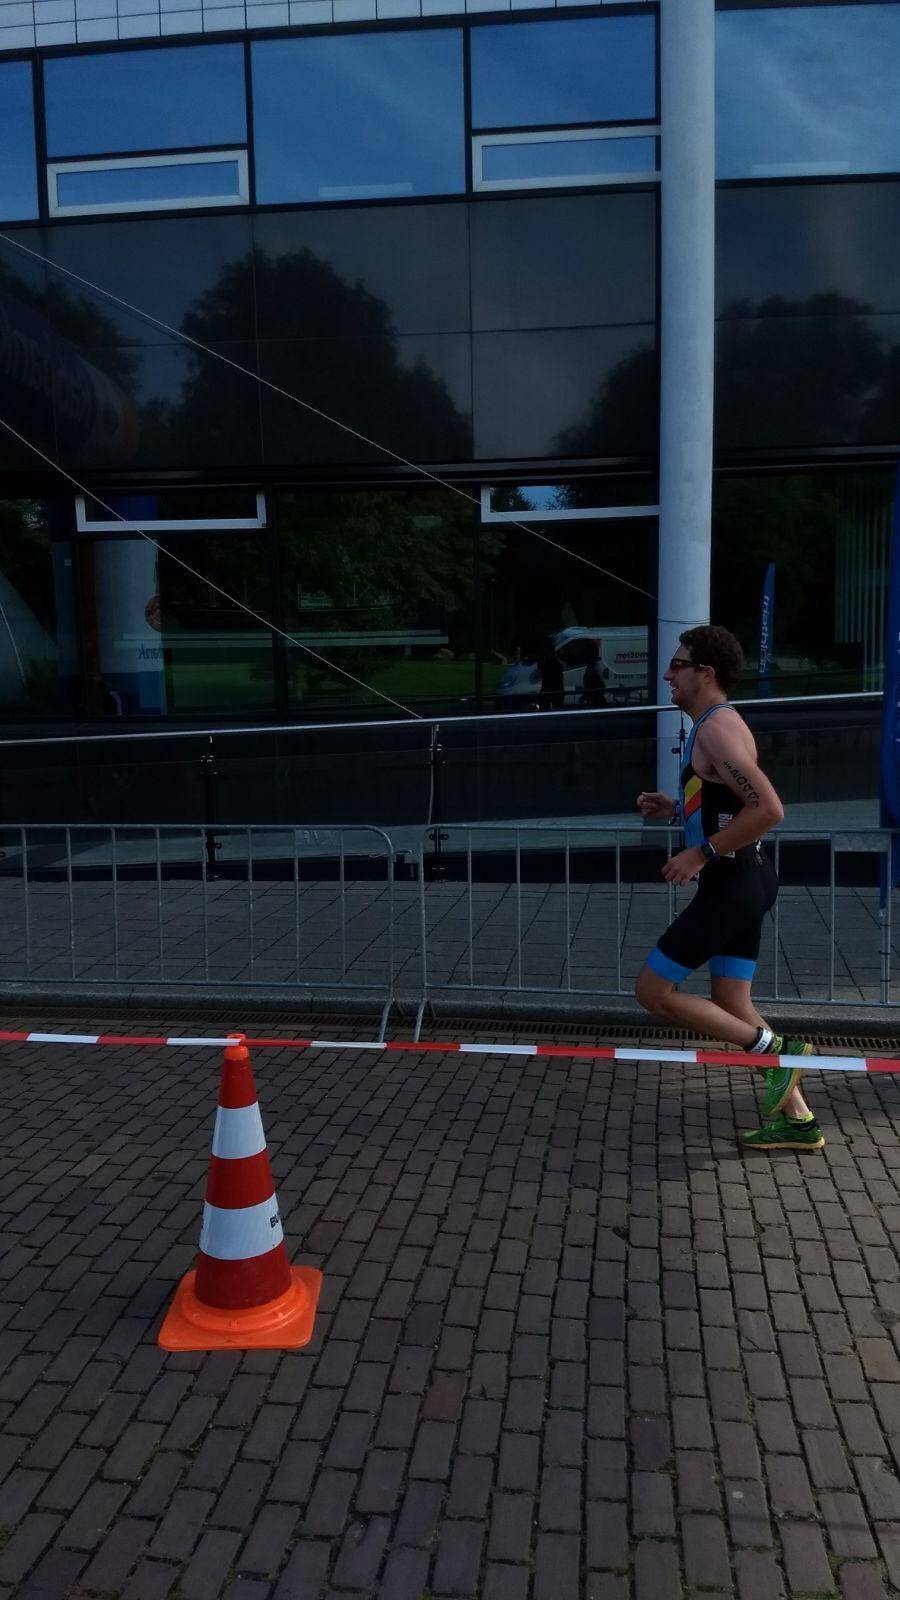 Rotterdam Frederik Van dijck run